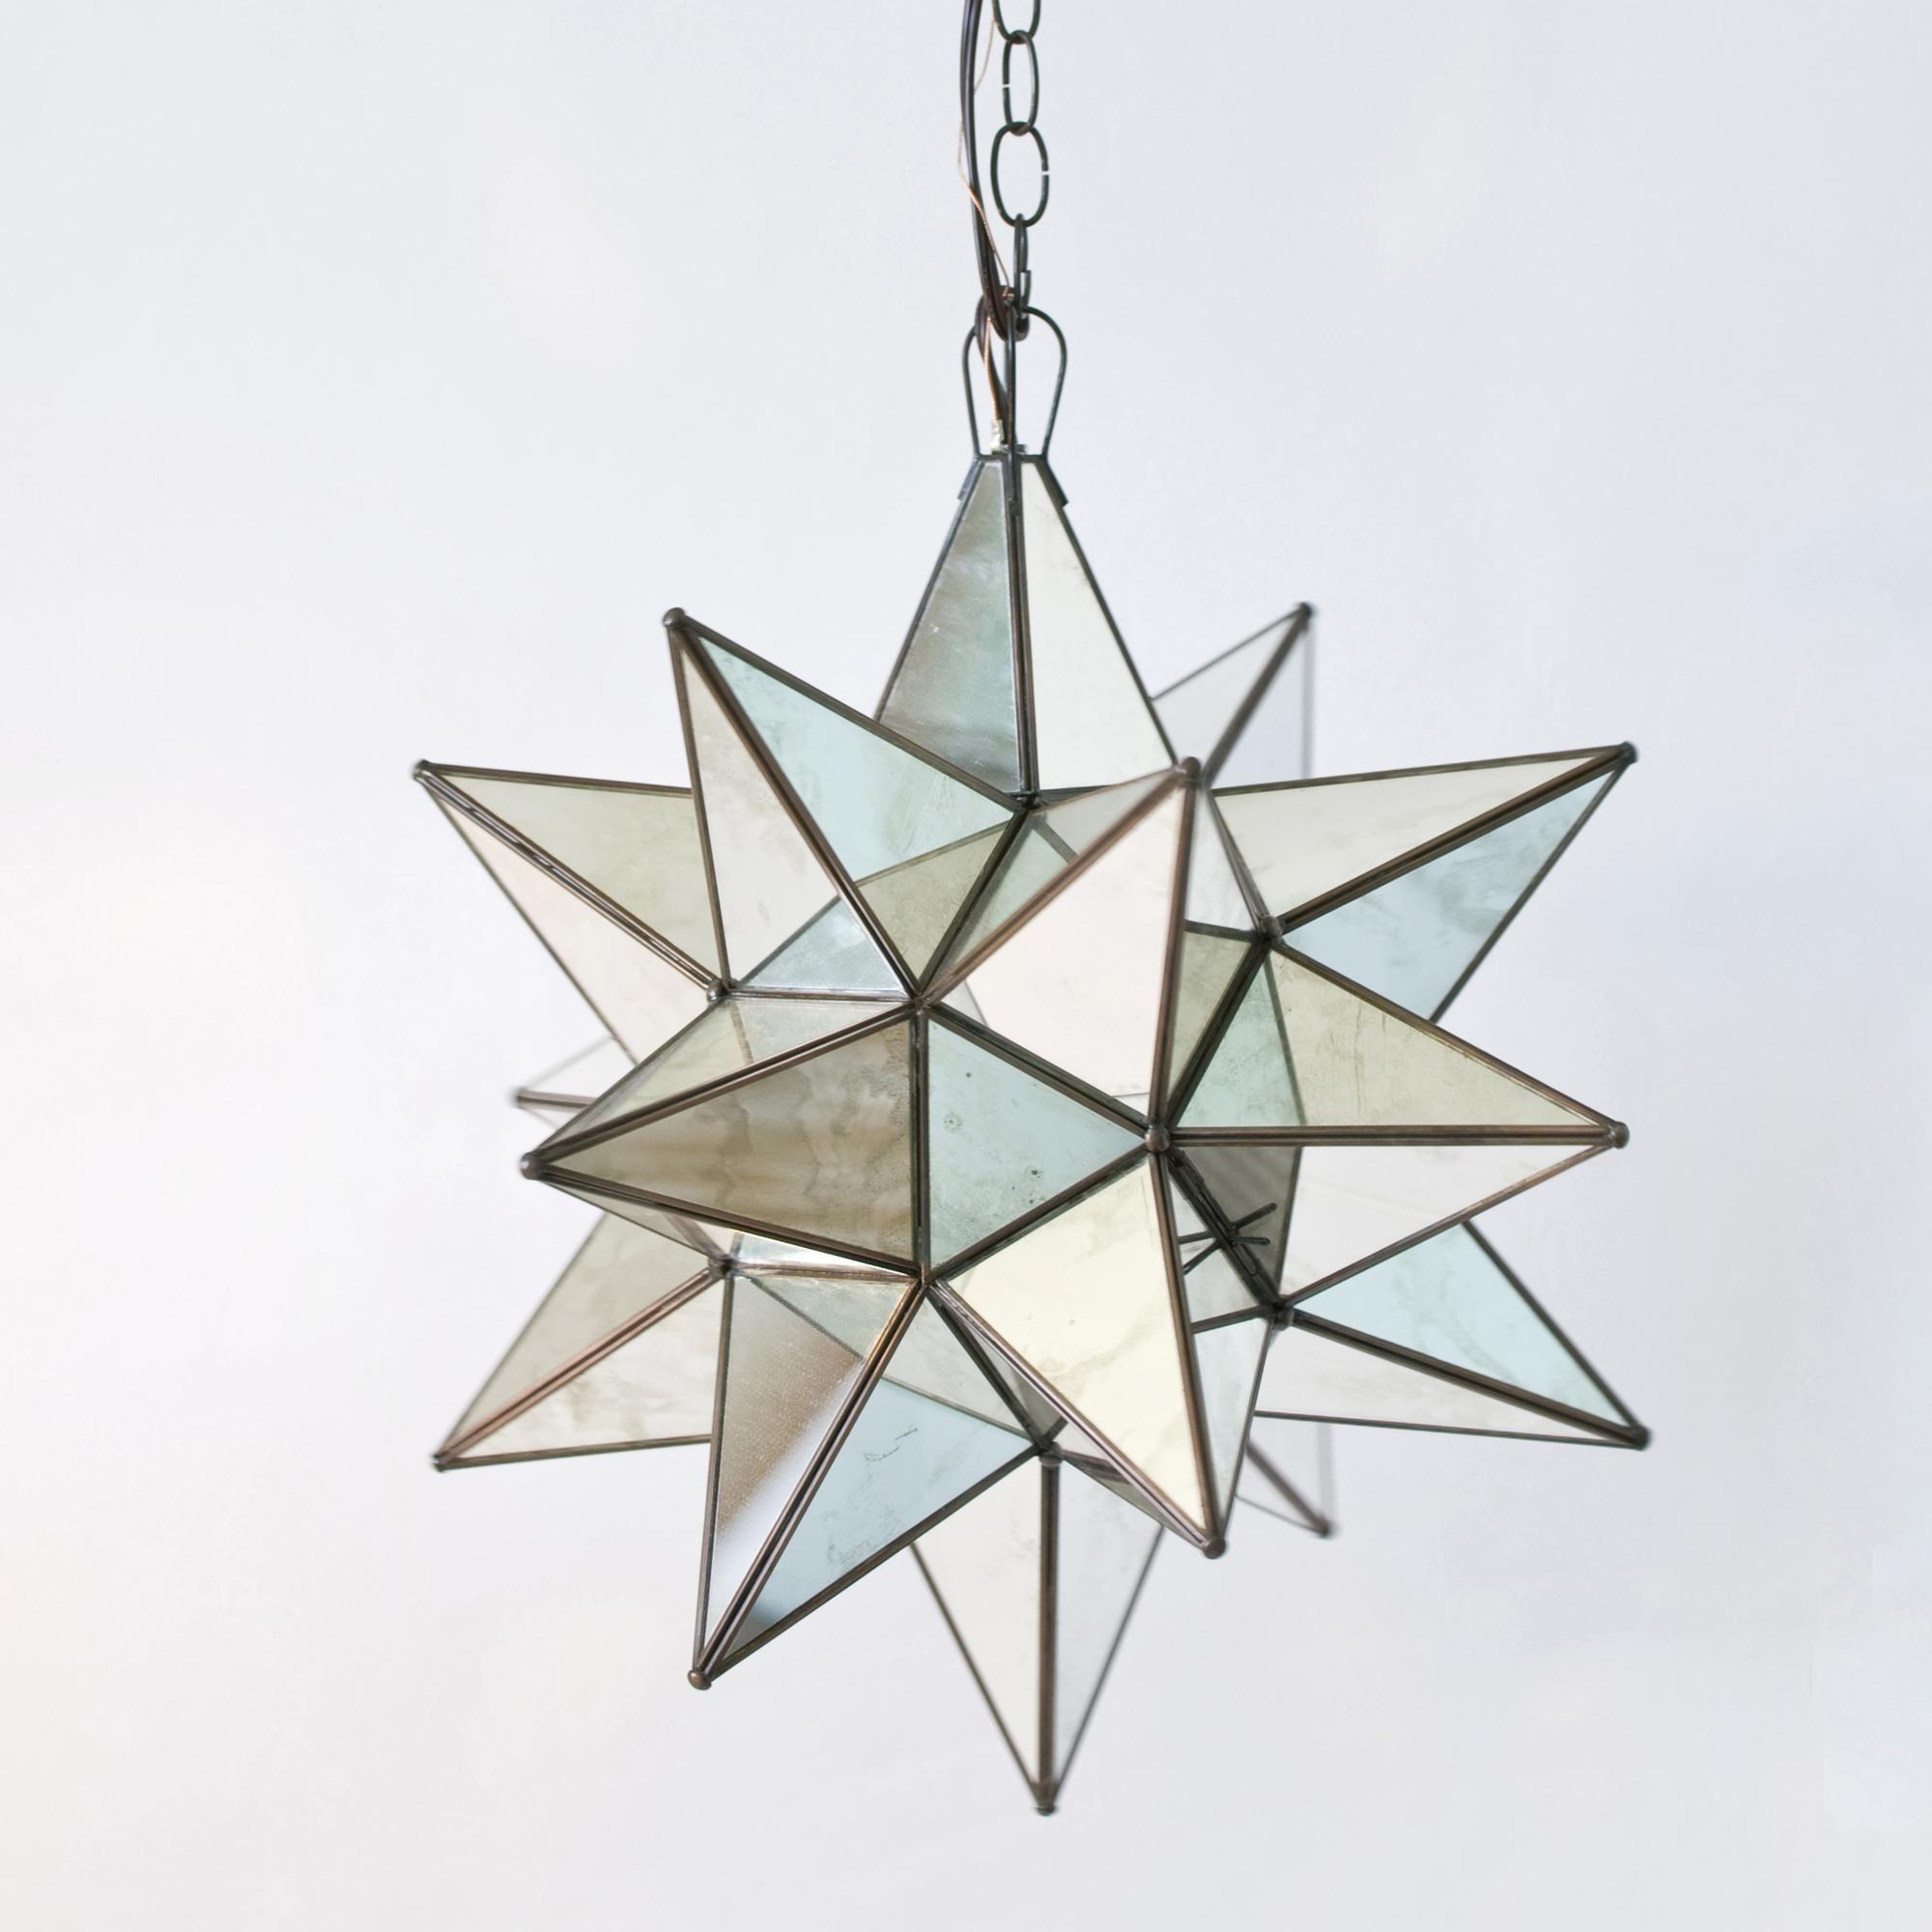 Moravian Star Pendant Light Outdoor Budapestsightseeing Org